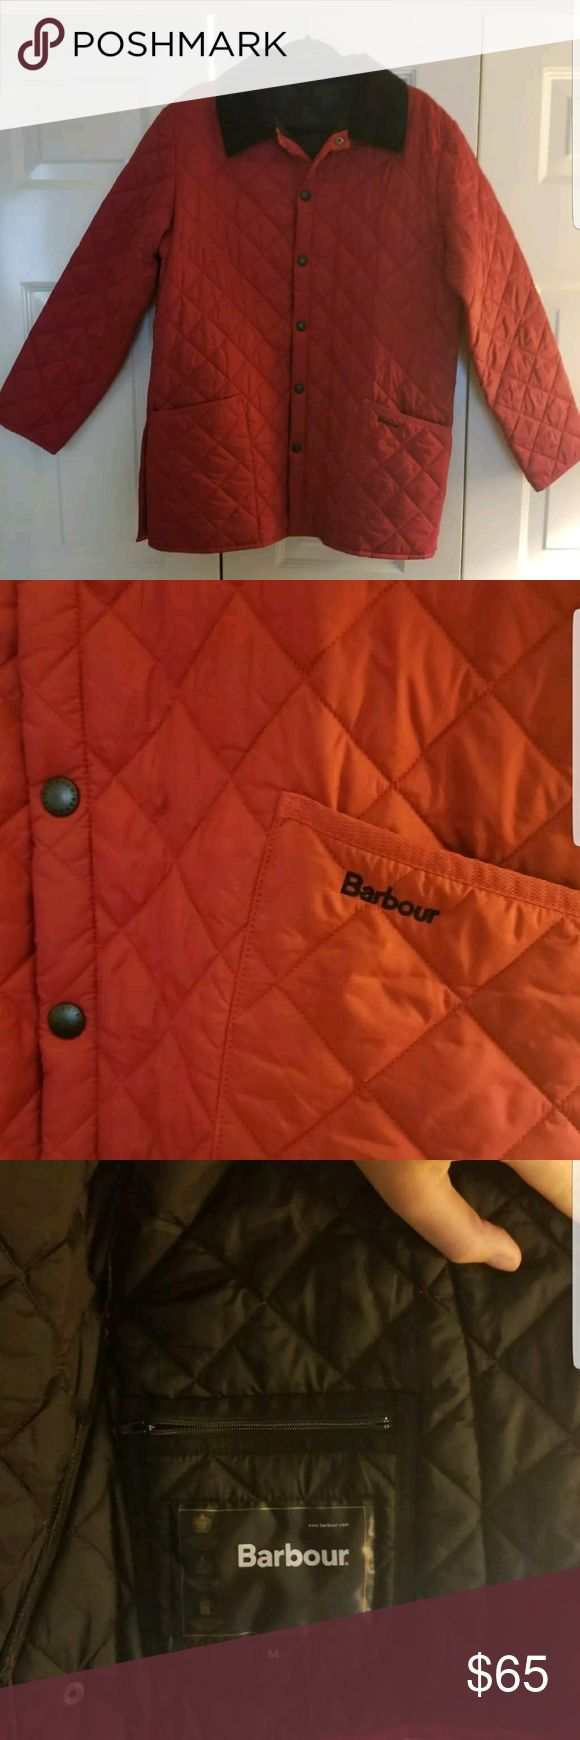 EUC Barbour Liddesdale Jacket Classic barbour jacket in a rare color combination. Barbour Jackets & Coats